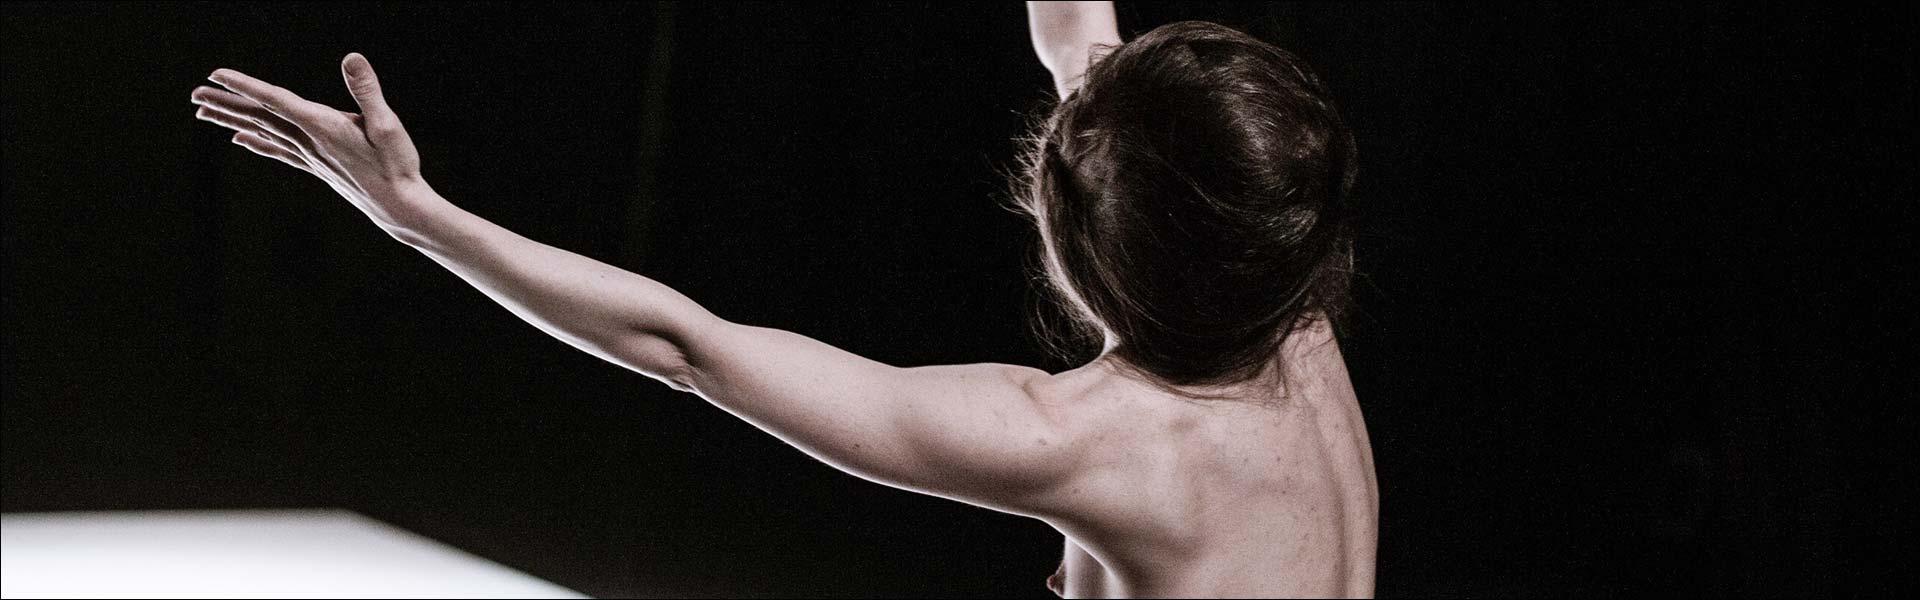 le-recital-17-theatre-de-la-cite-internationale-01bigb-yasmine-higonnet